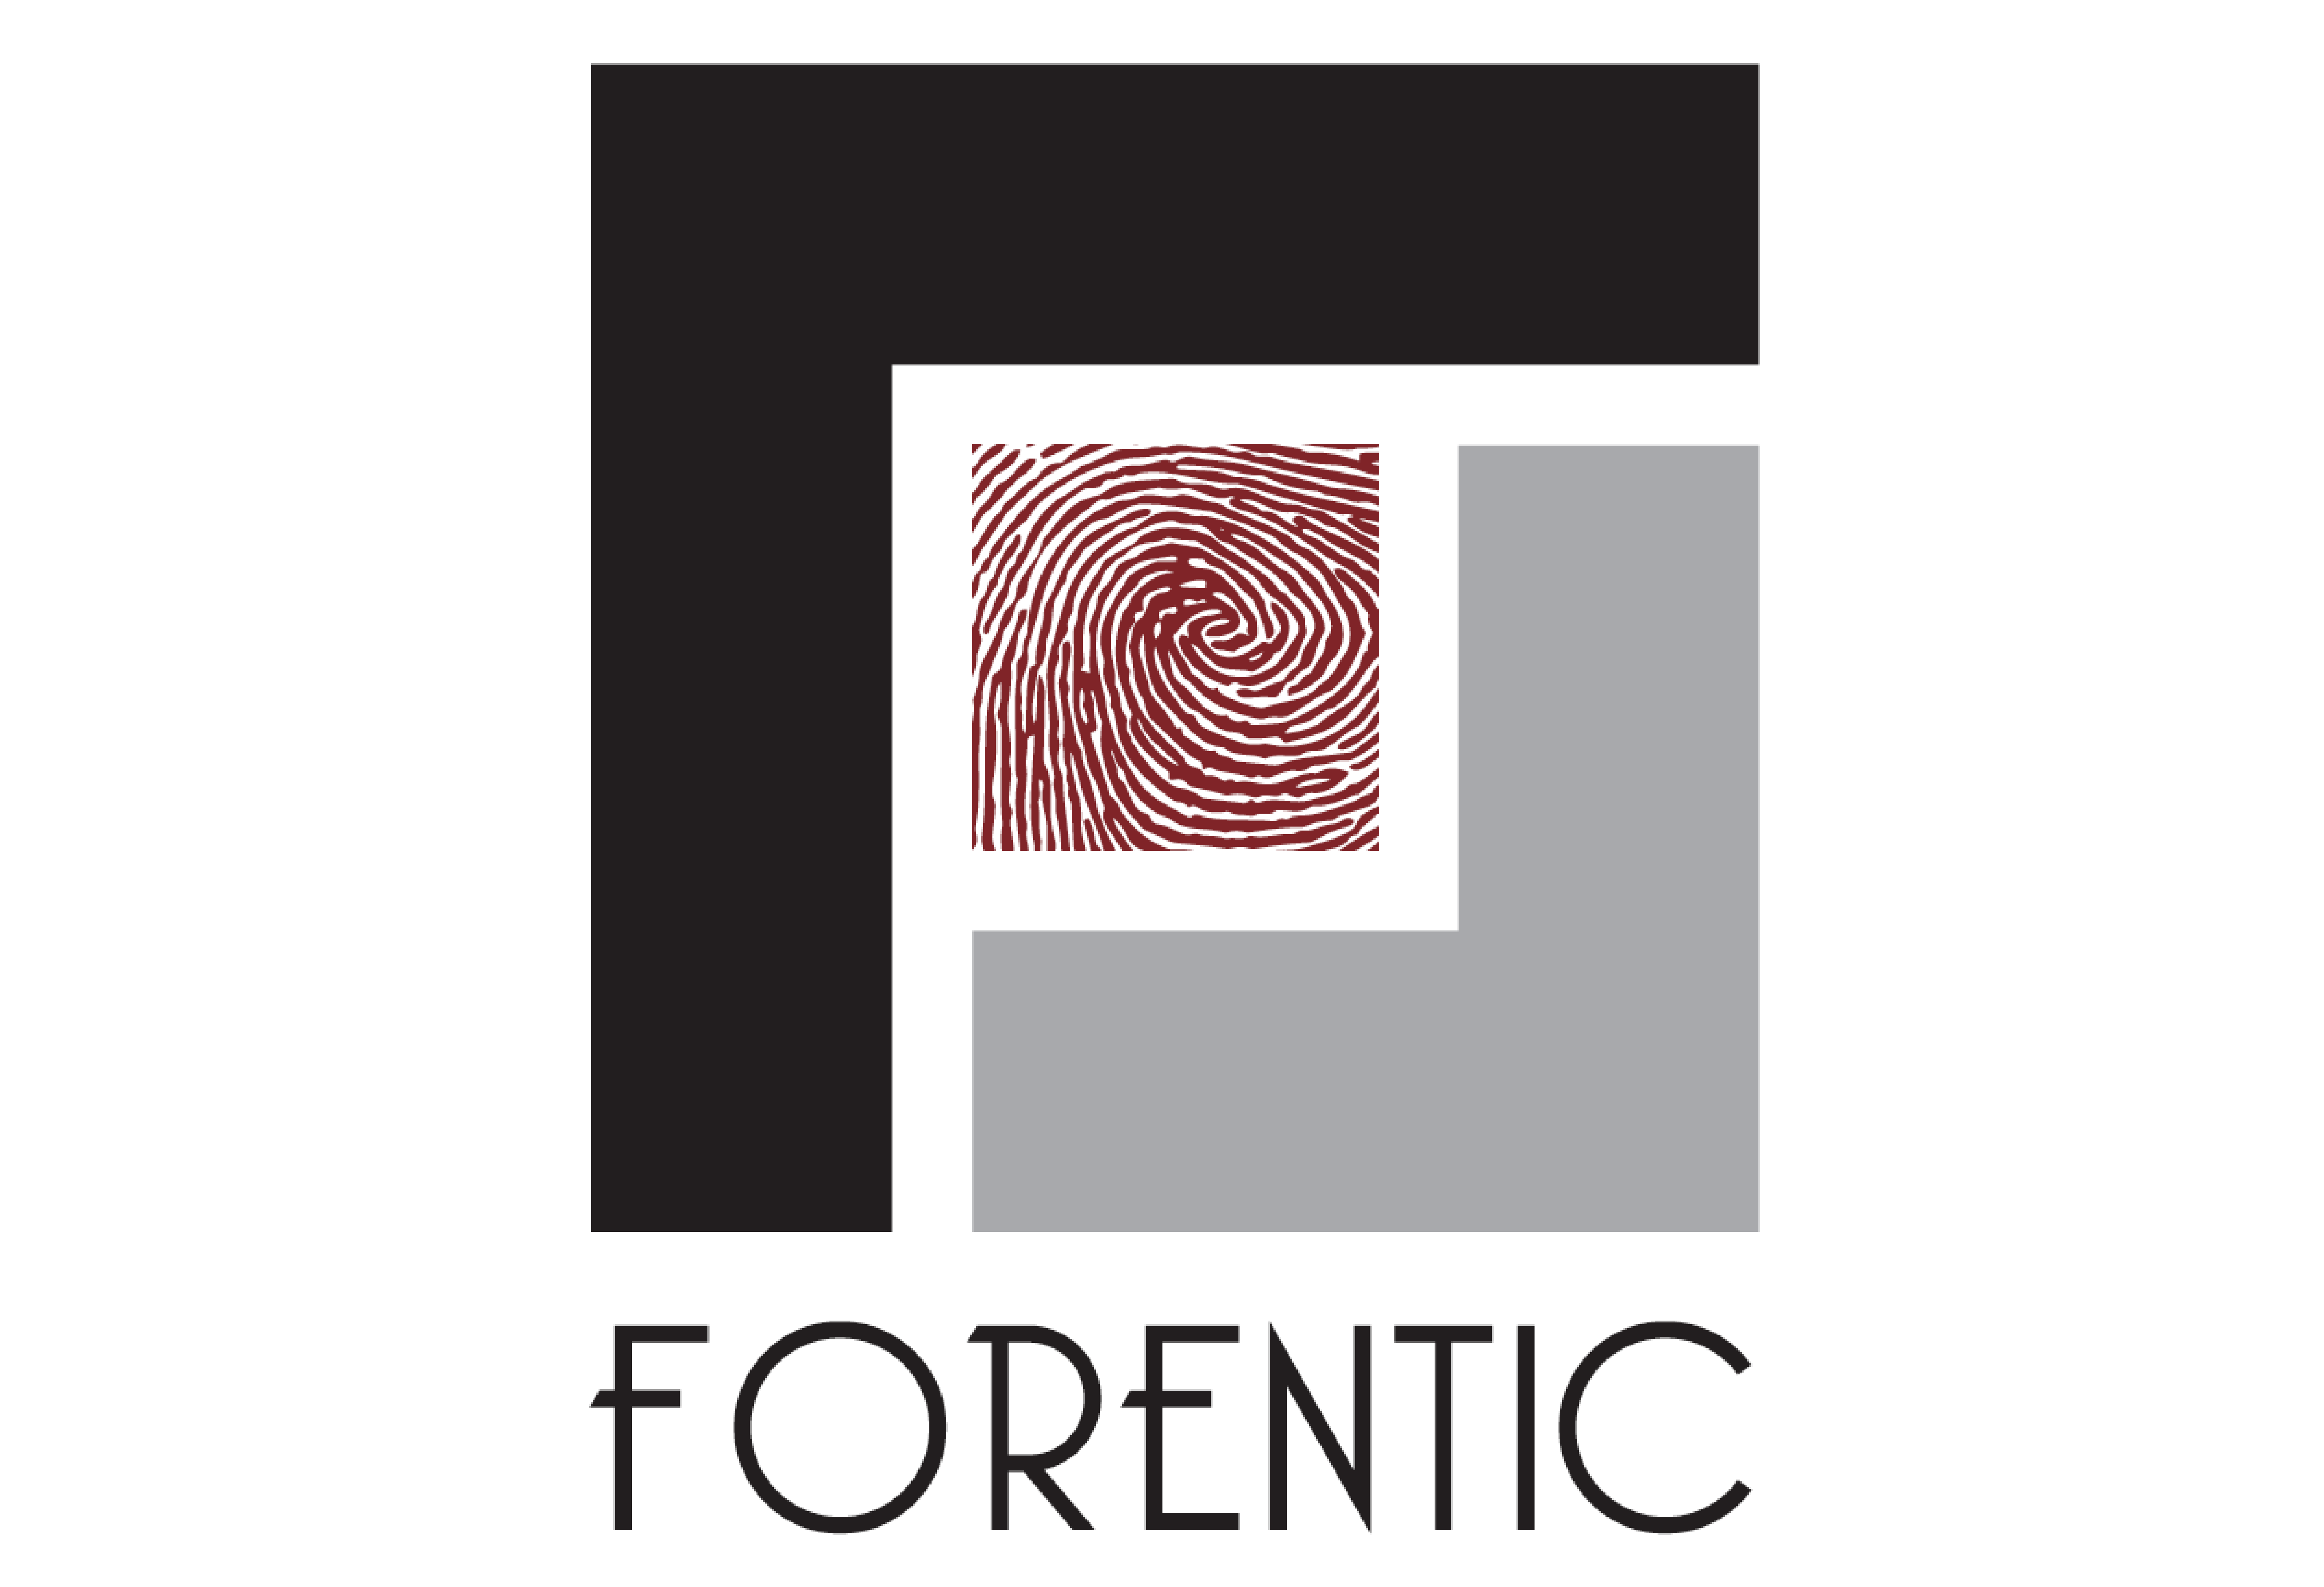 Forentic